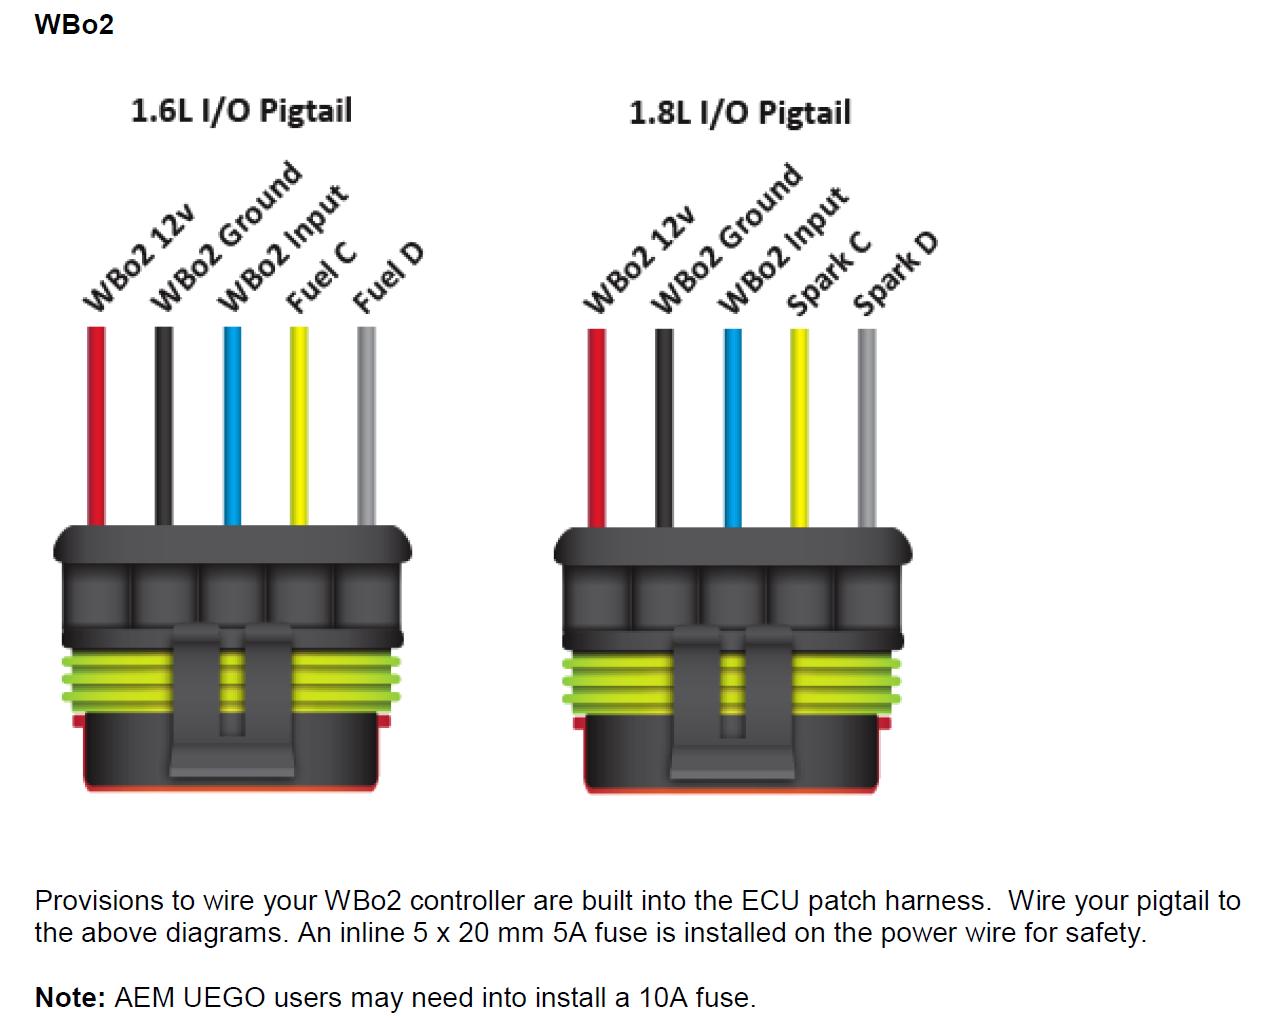 wideband 5 wire 4 wire o2 diagram box wiring diagram5 wire o2 sensor diagram wiring diagram